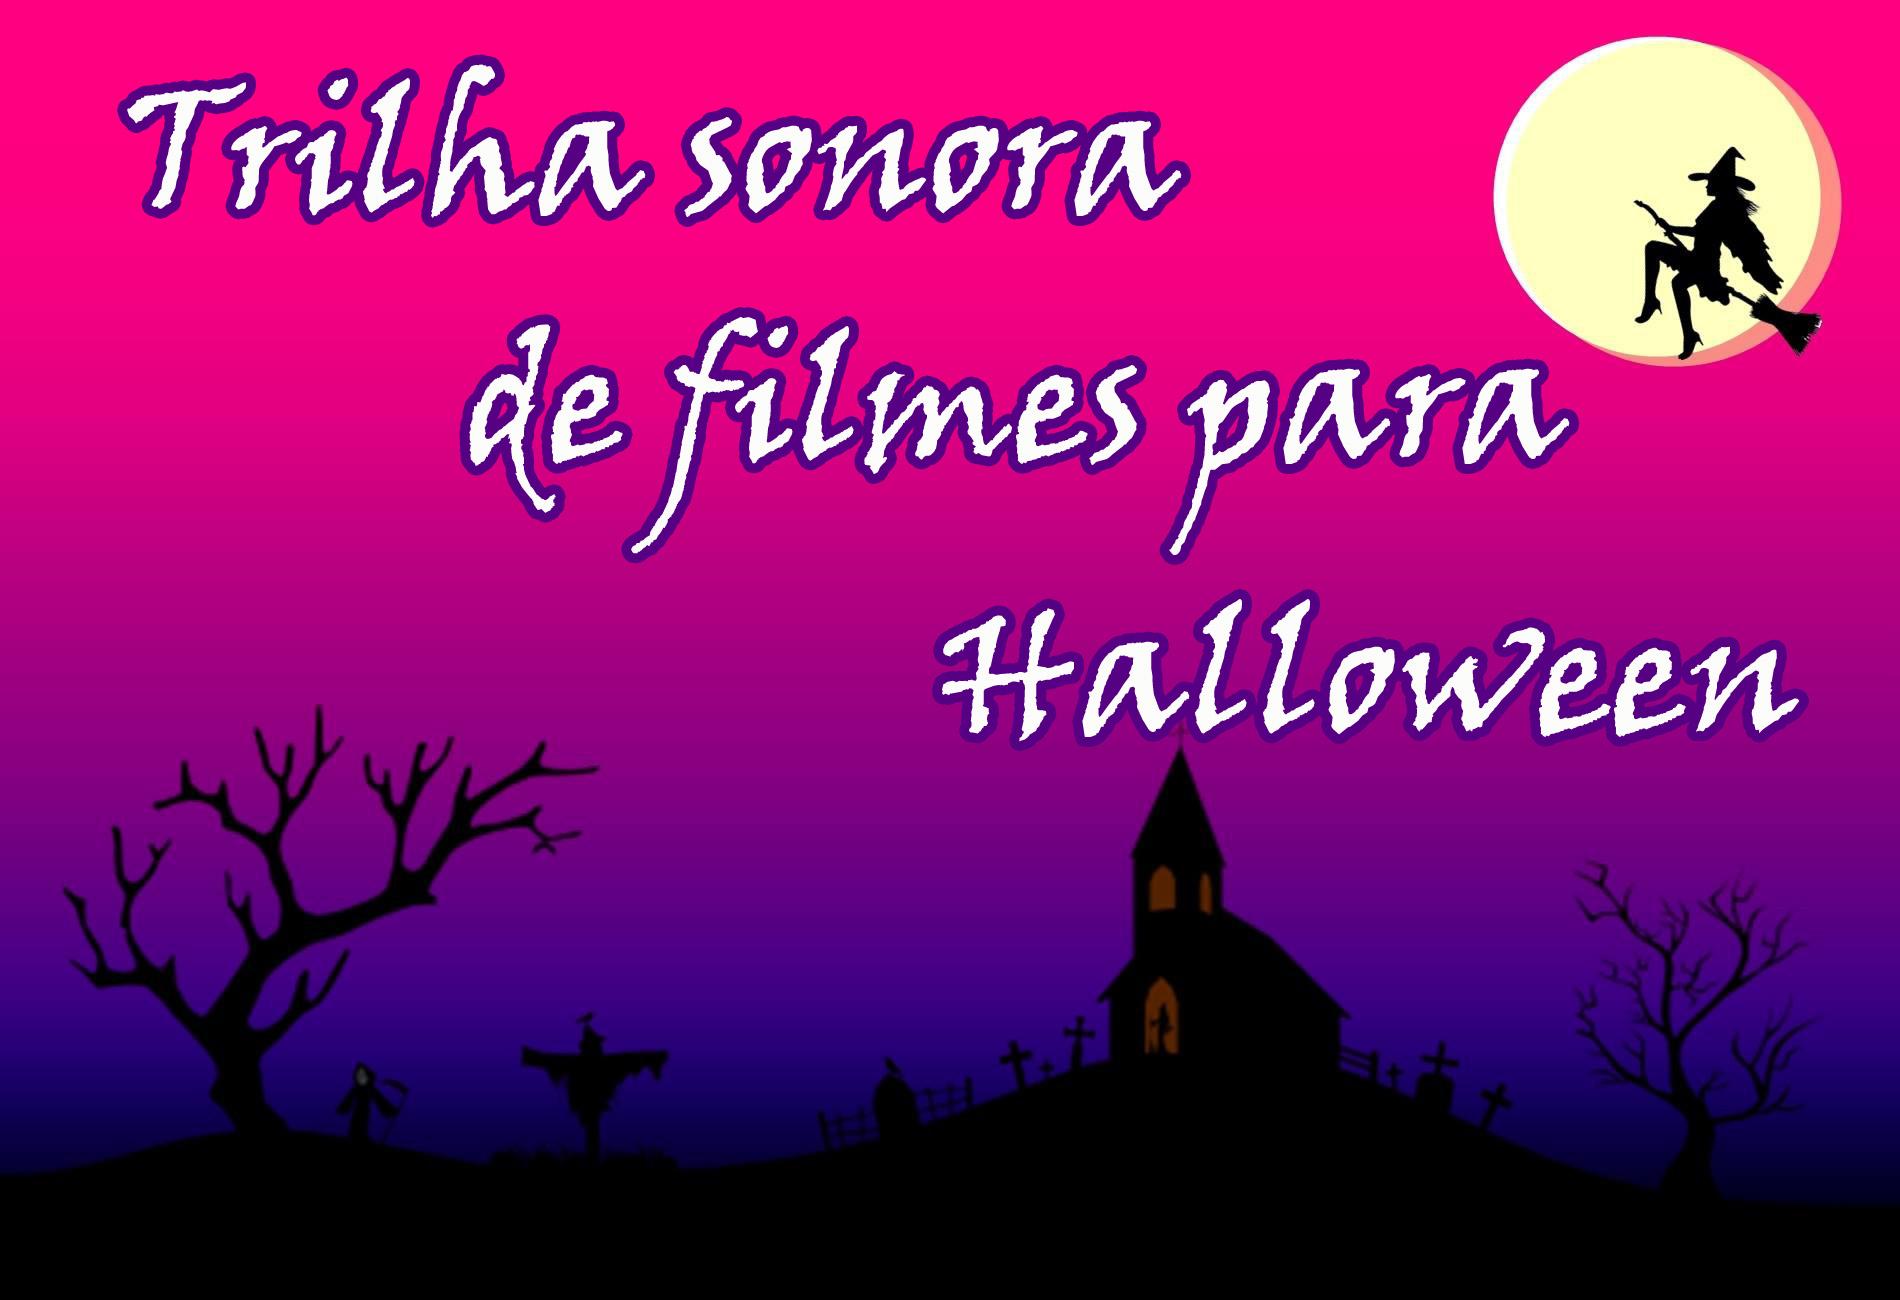 trilha-sonora-de-filmes-para-halloween